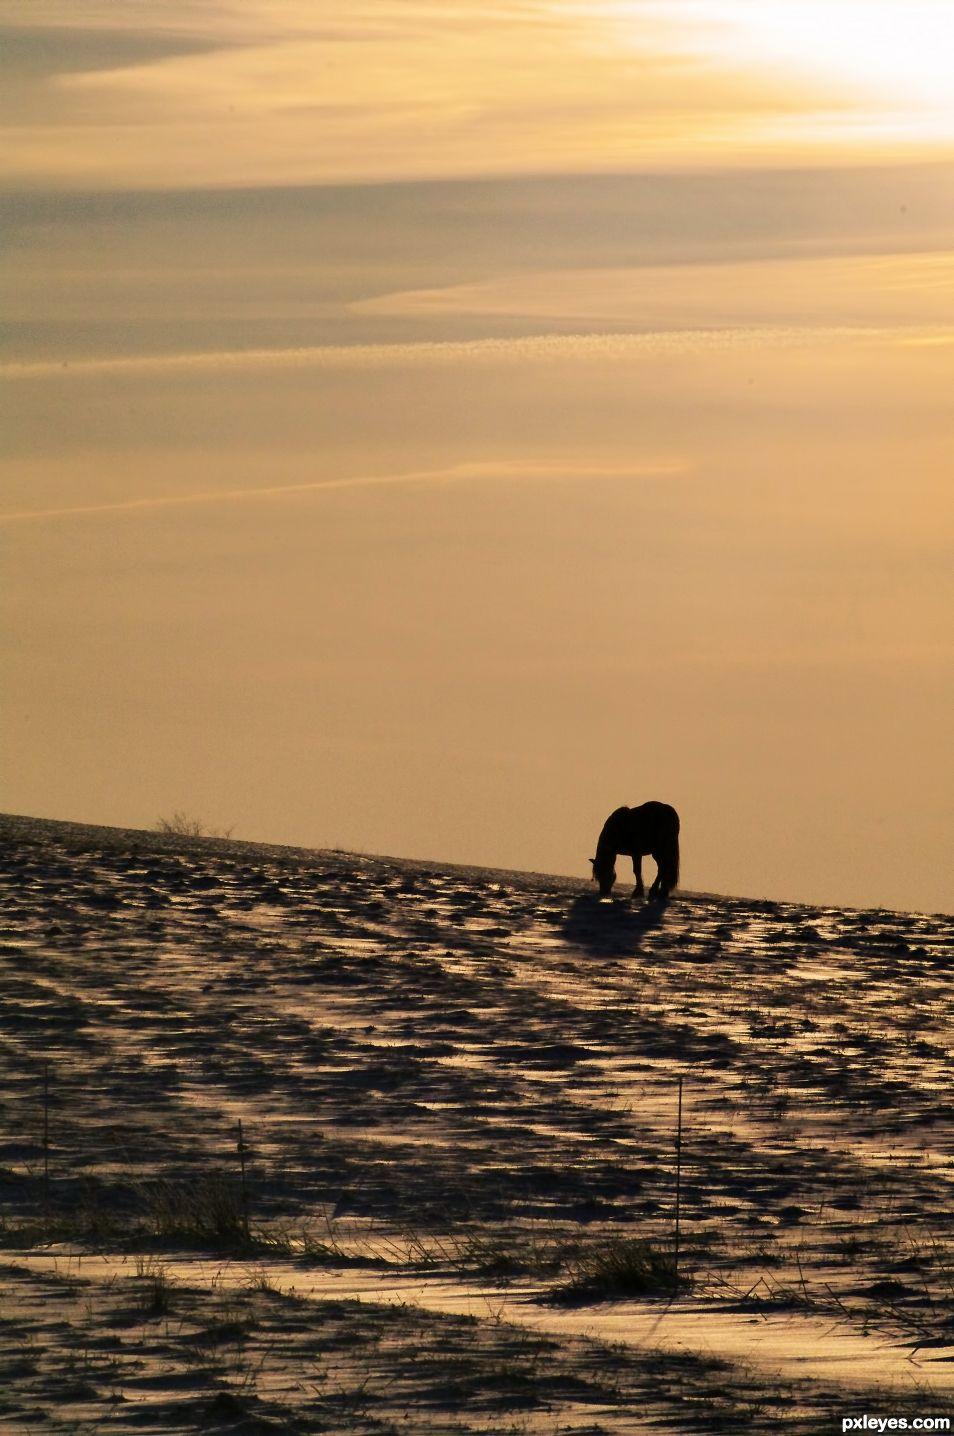 Horse on the Horizon